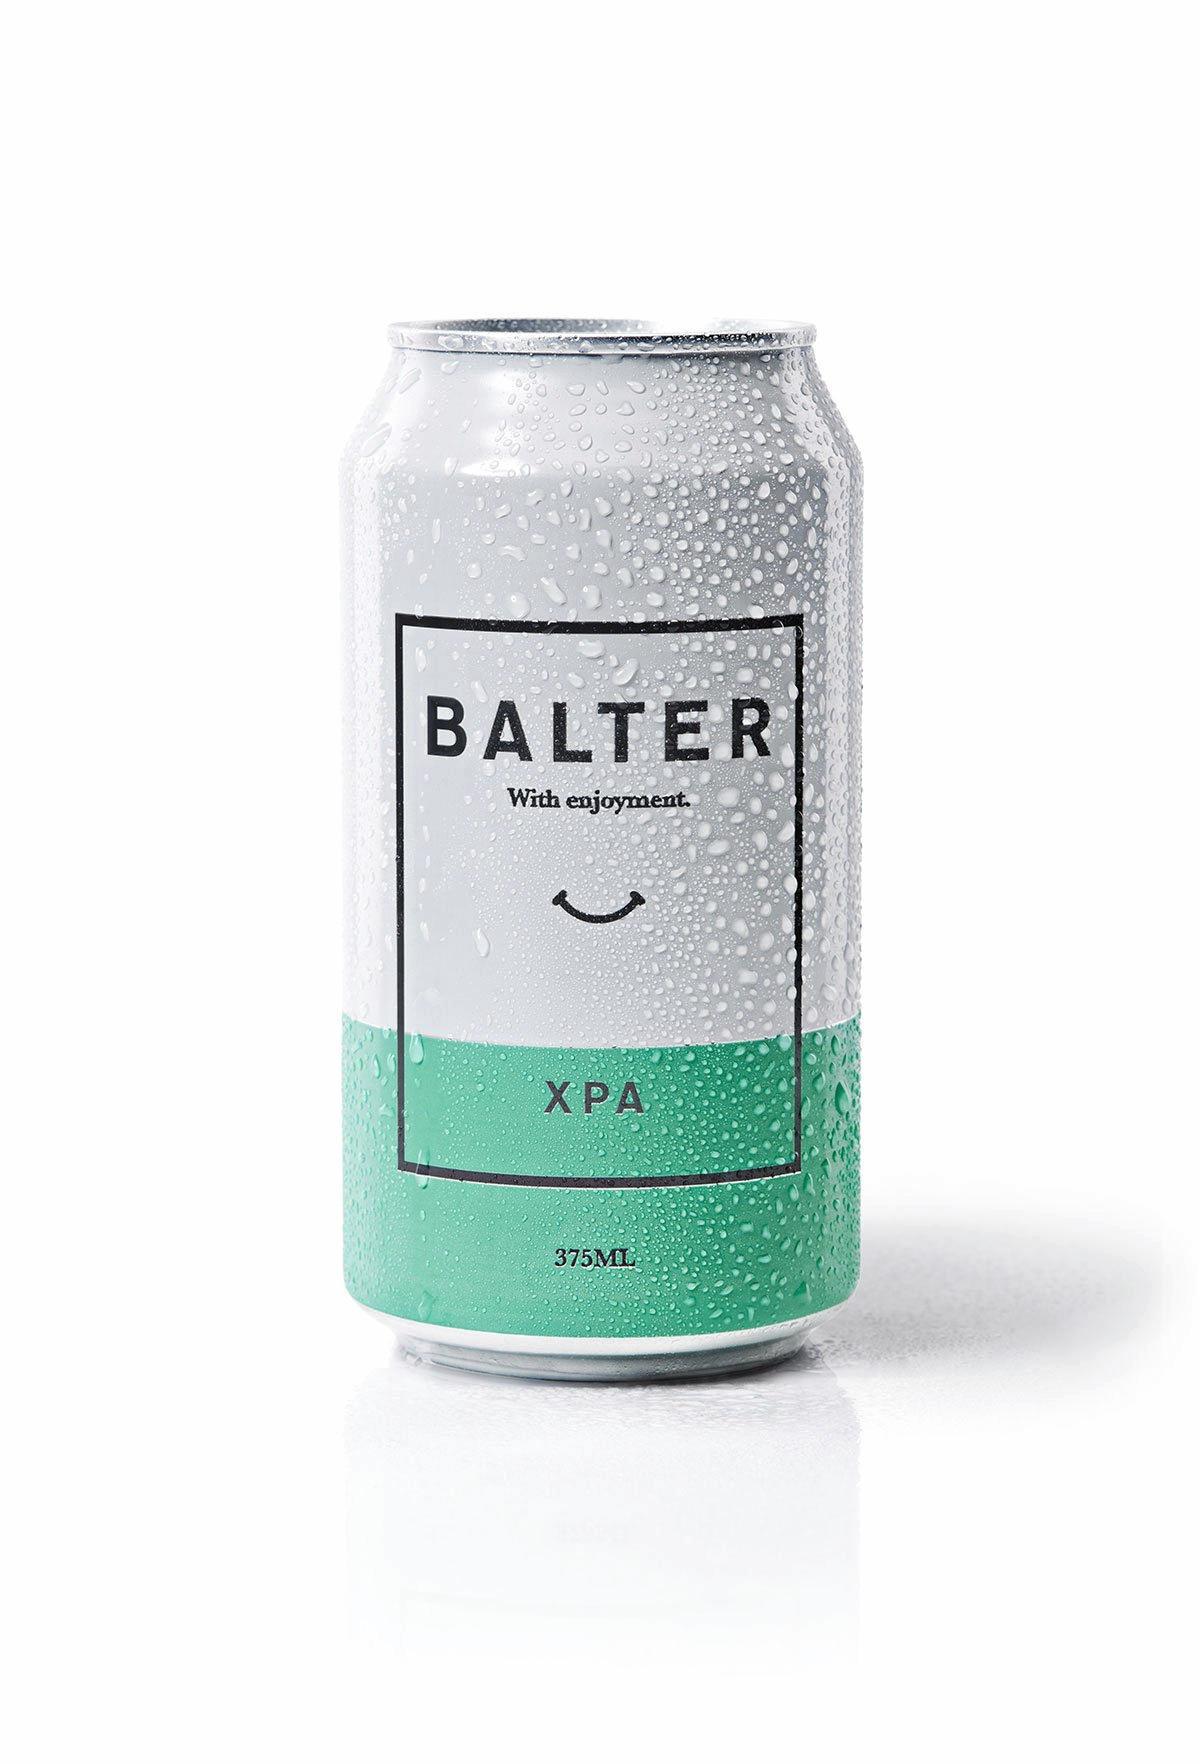 Balter XPA.